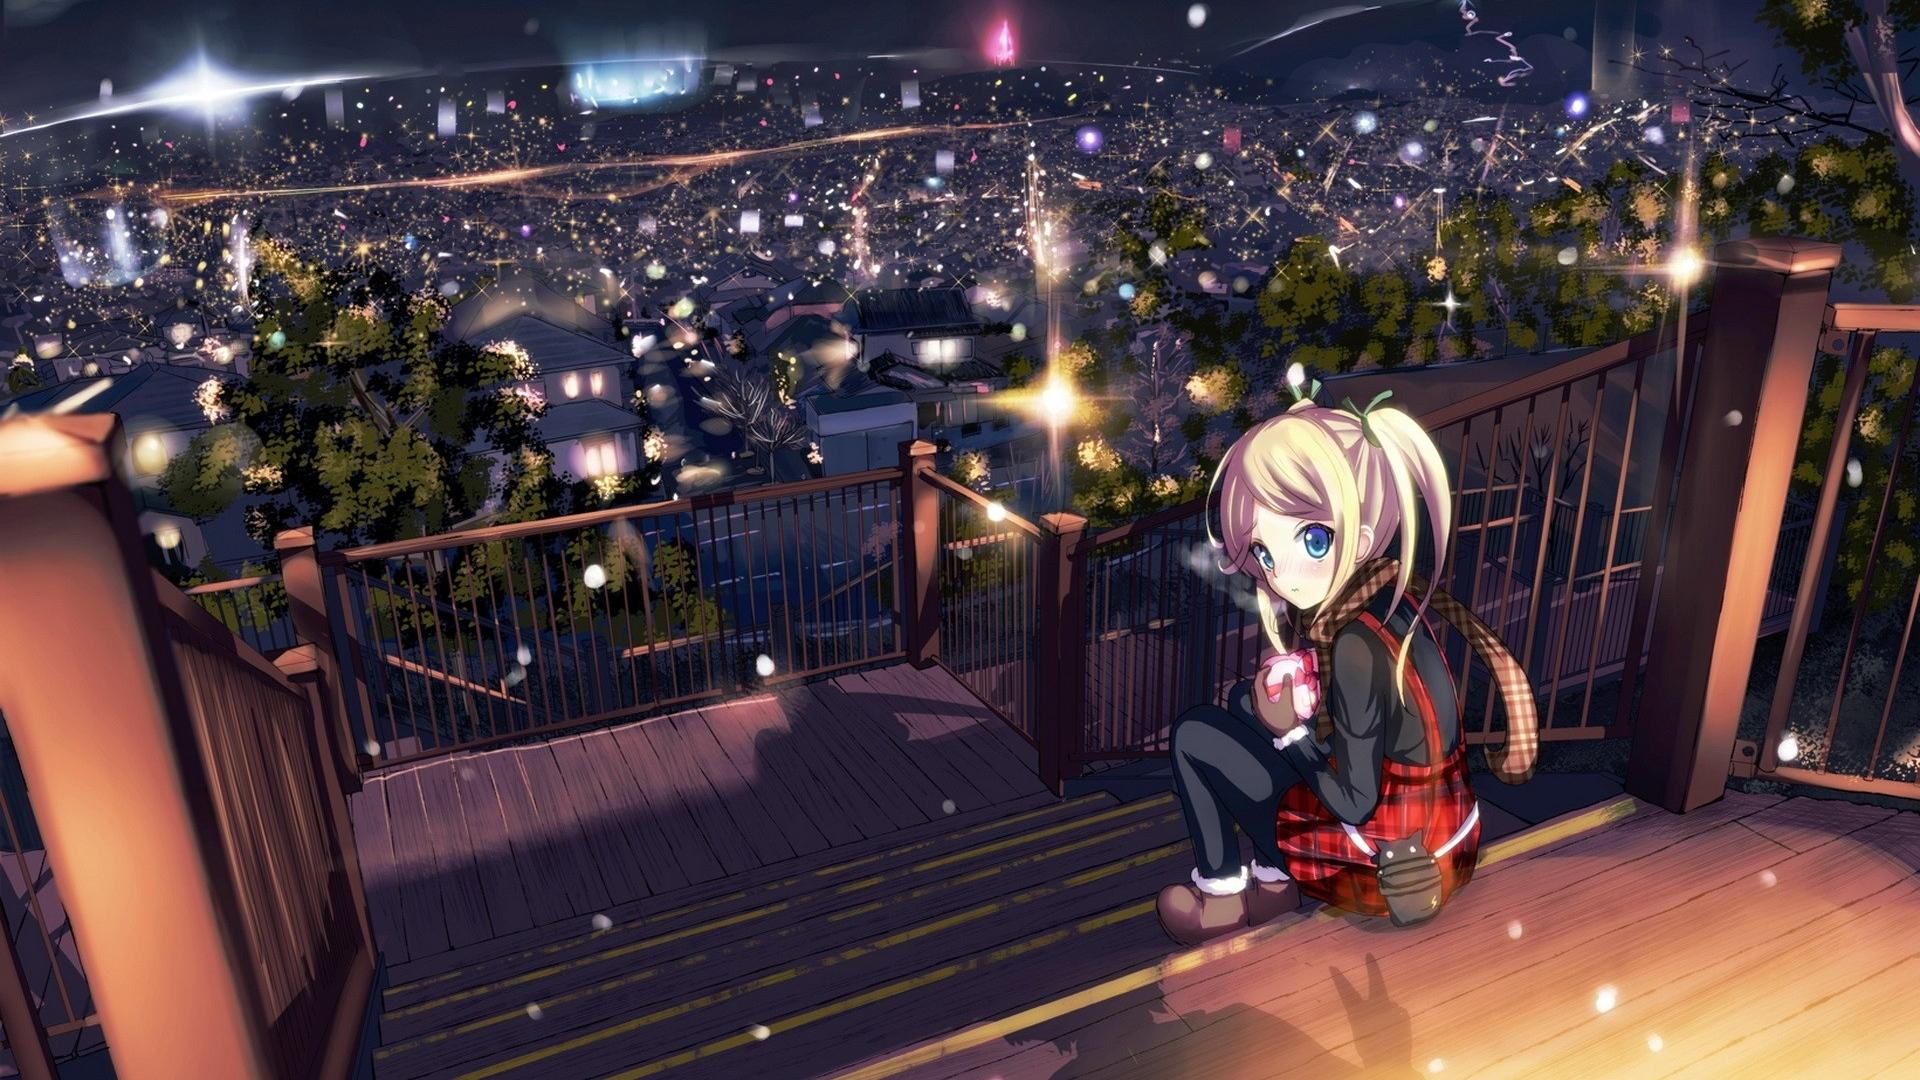 Download-1920x1080-Landscape-Blue-Anime-Full-HD-1080p-HD-Background-wallpaper-wp3804798